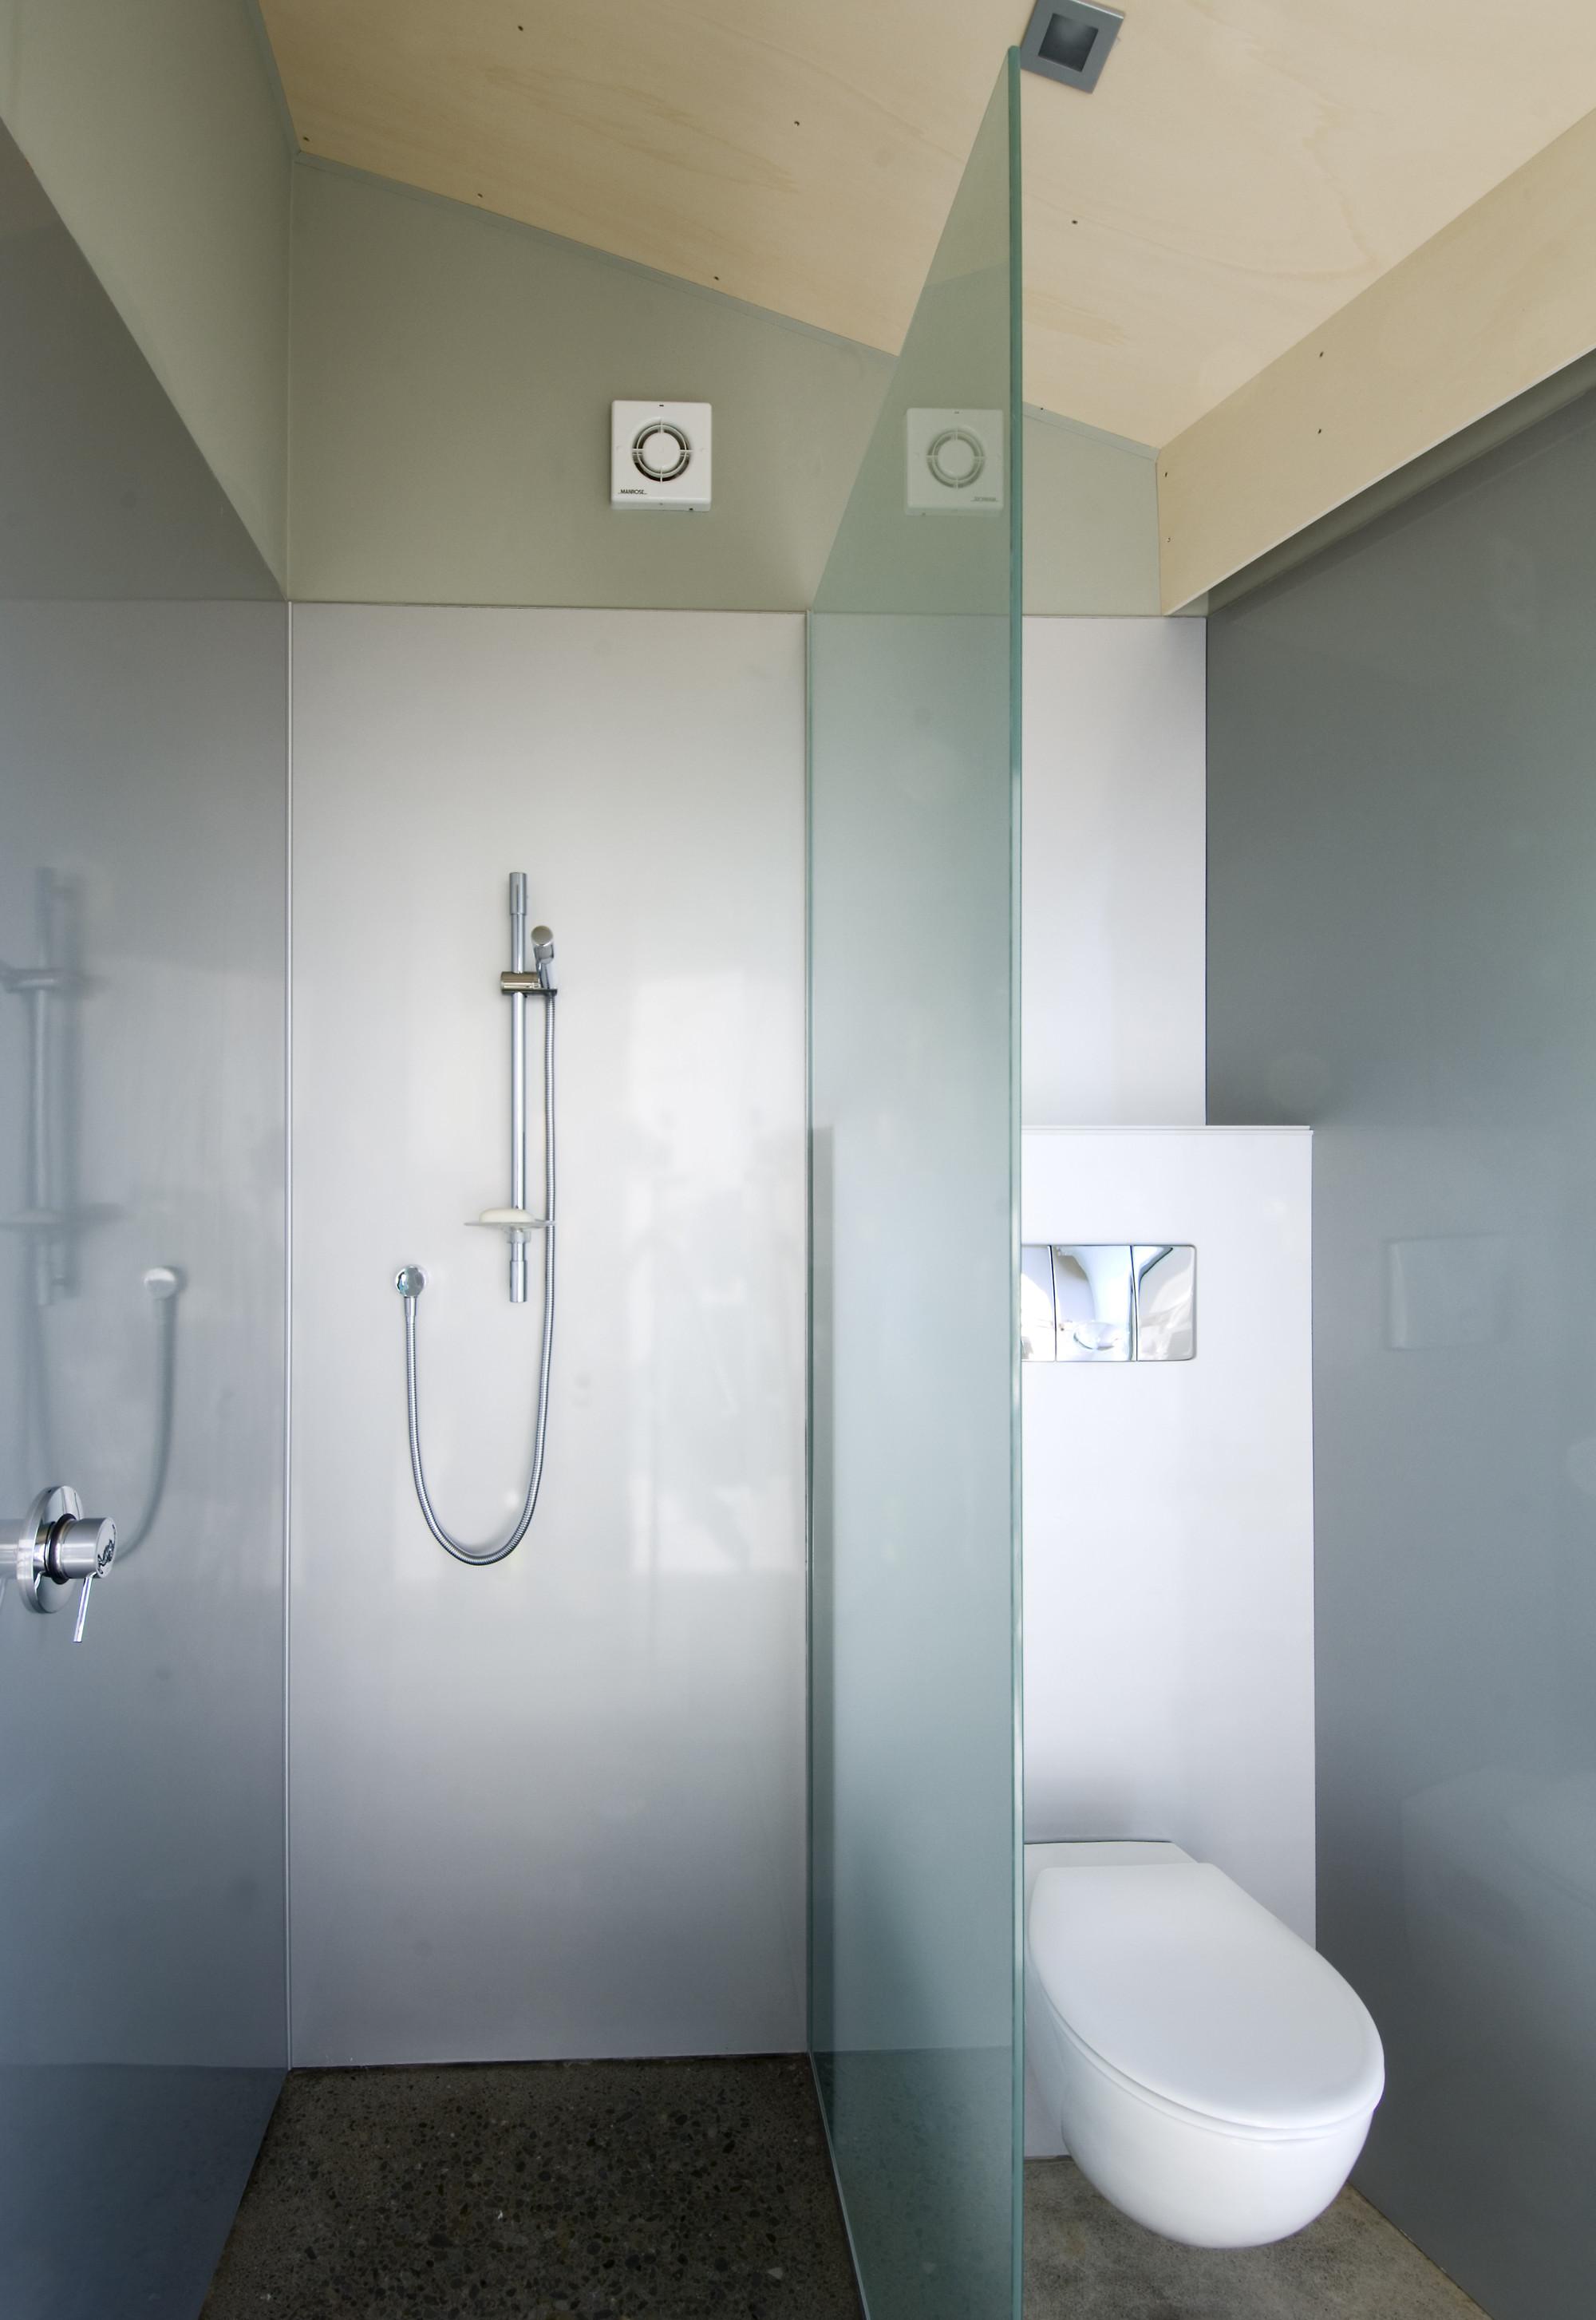 Gallery of cornege preston house bonnifait giesen 8 for Radiateur salle de bain castorama